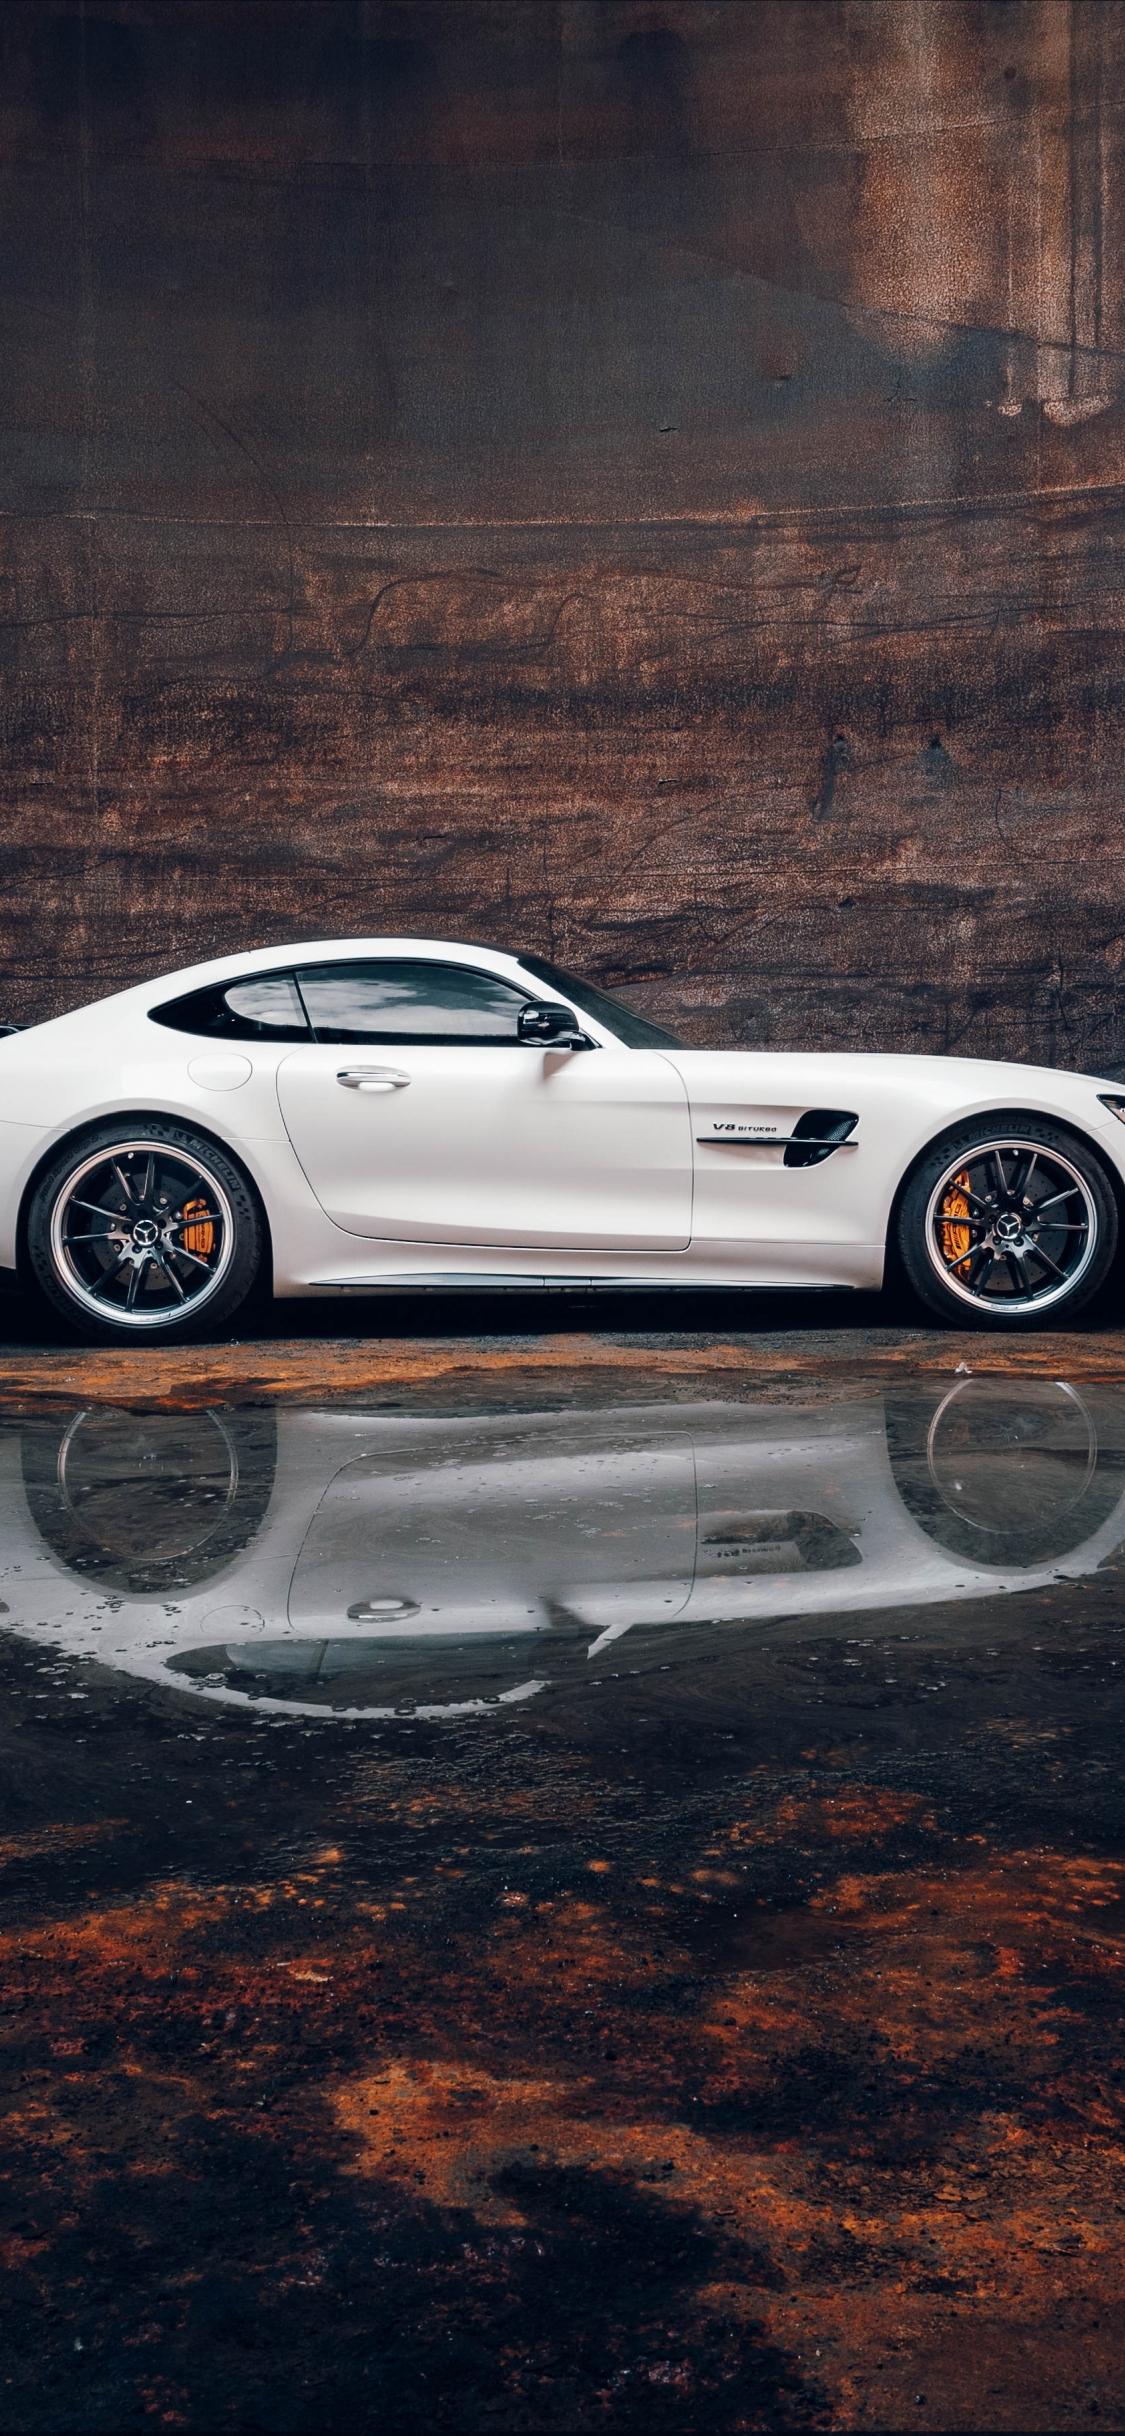 Download 1125x2436 Wallpaper Sports Car White Mercedes Amg